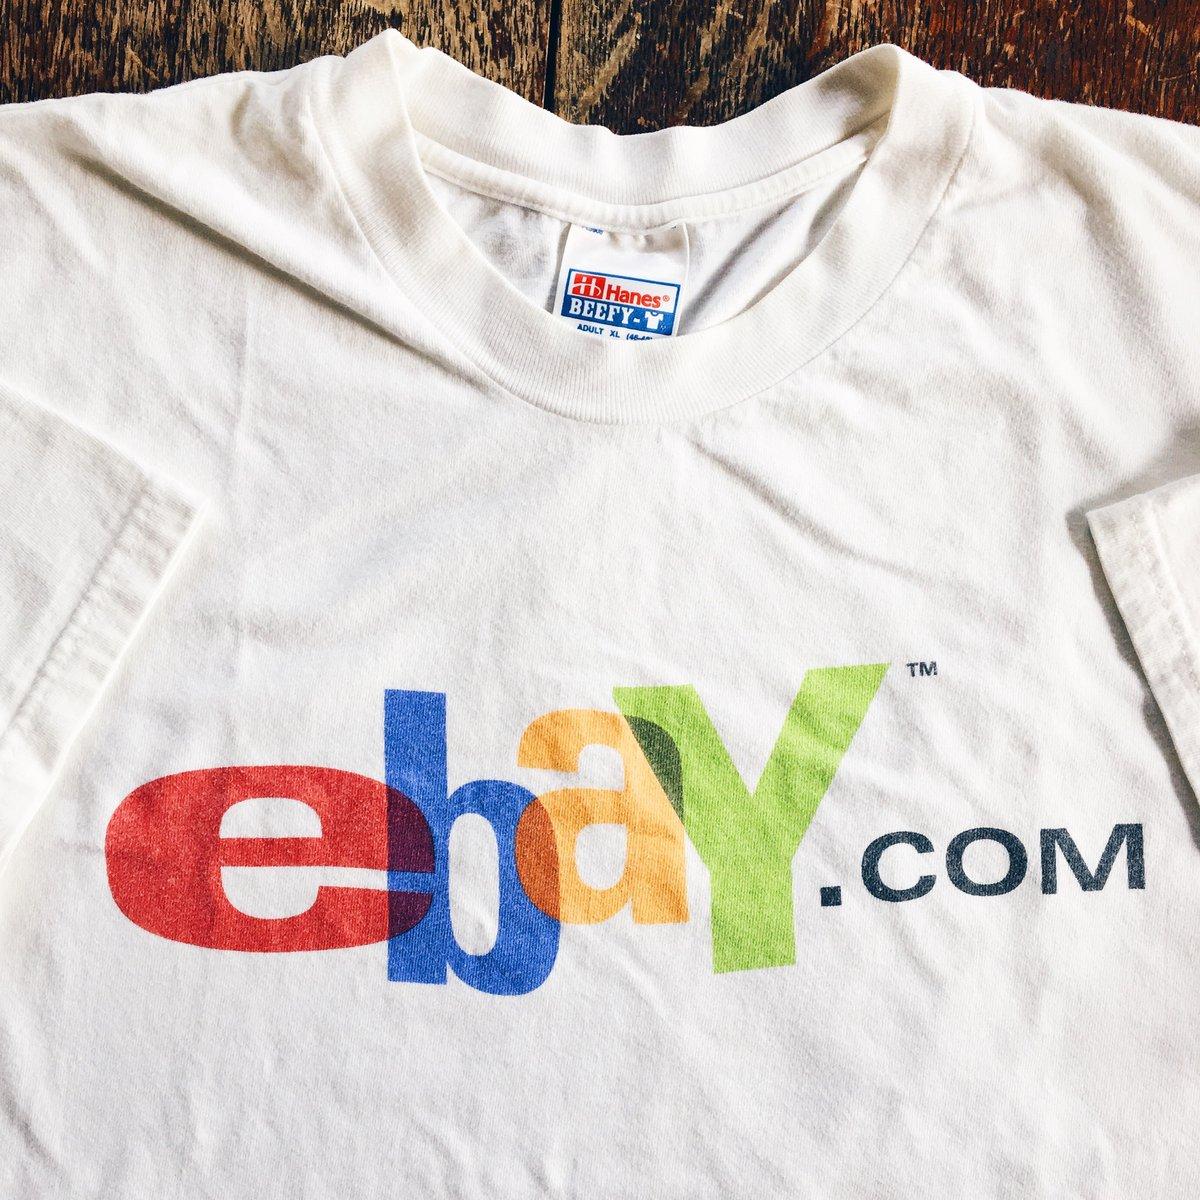 Image of Original Late 90's eBay Promo Tee.